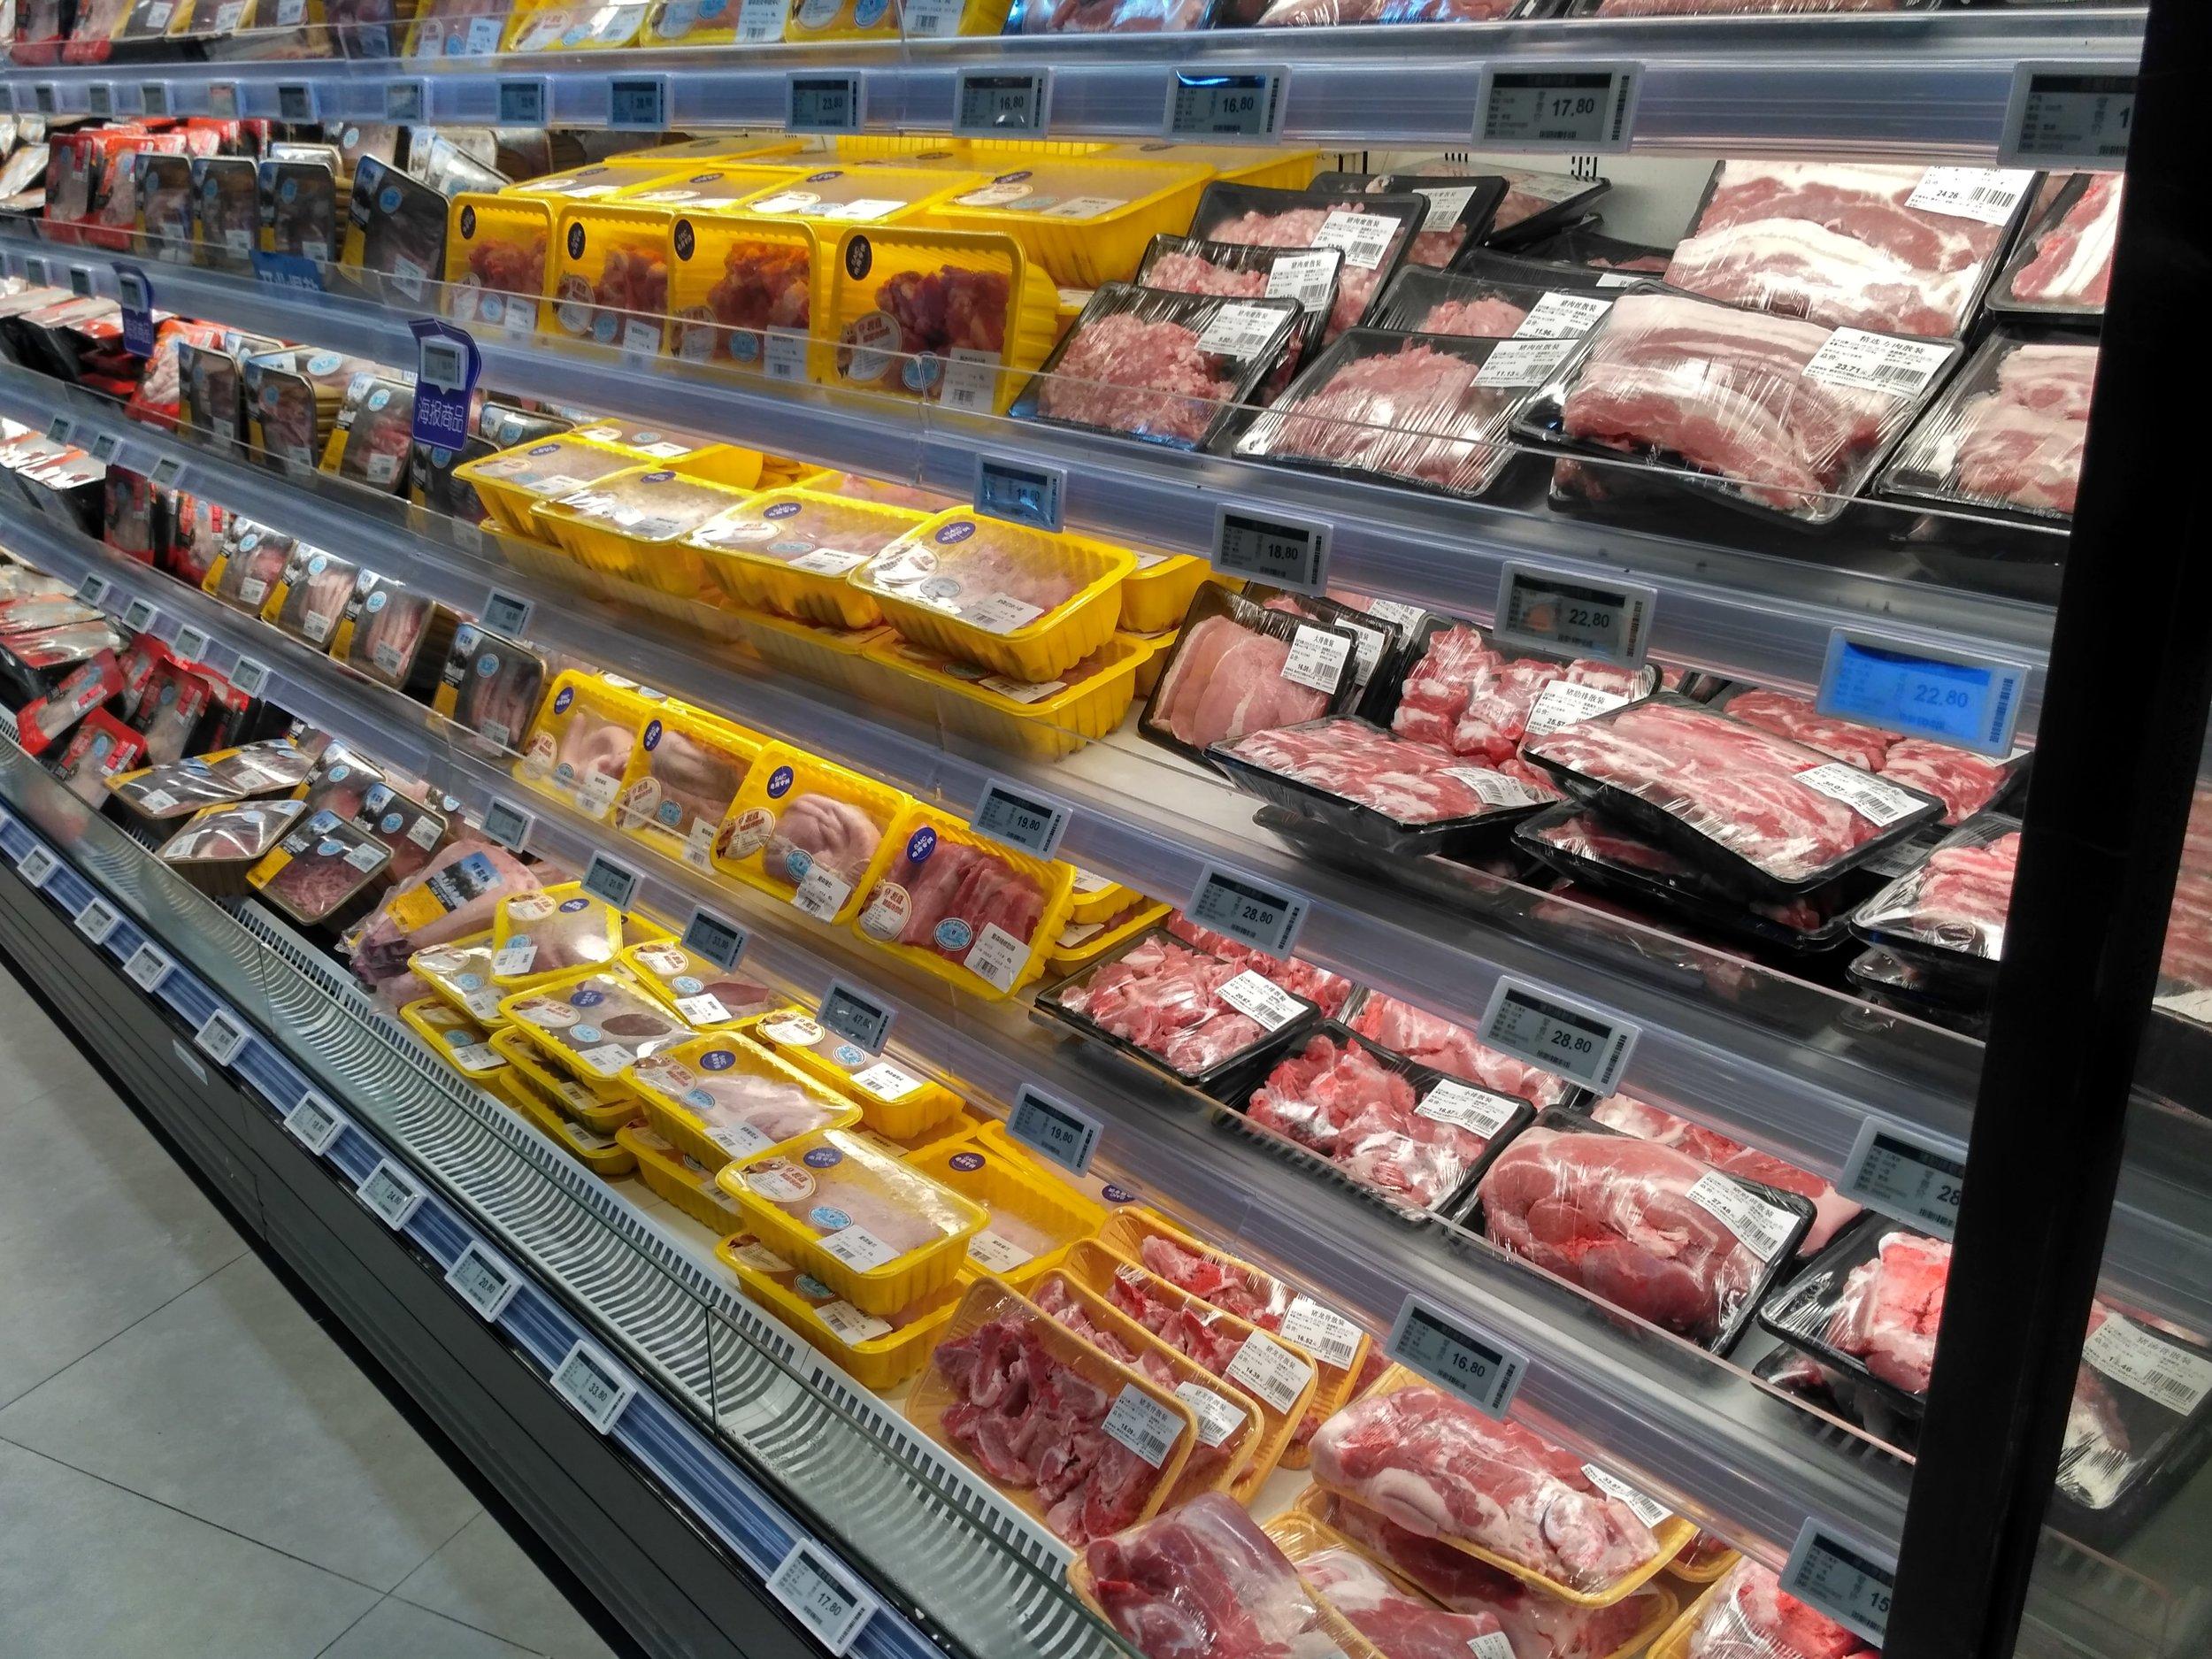 Digital price labels on fresh meat fridge shelves